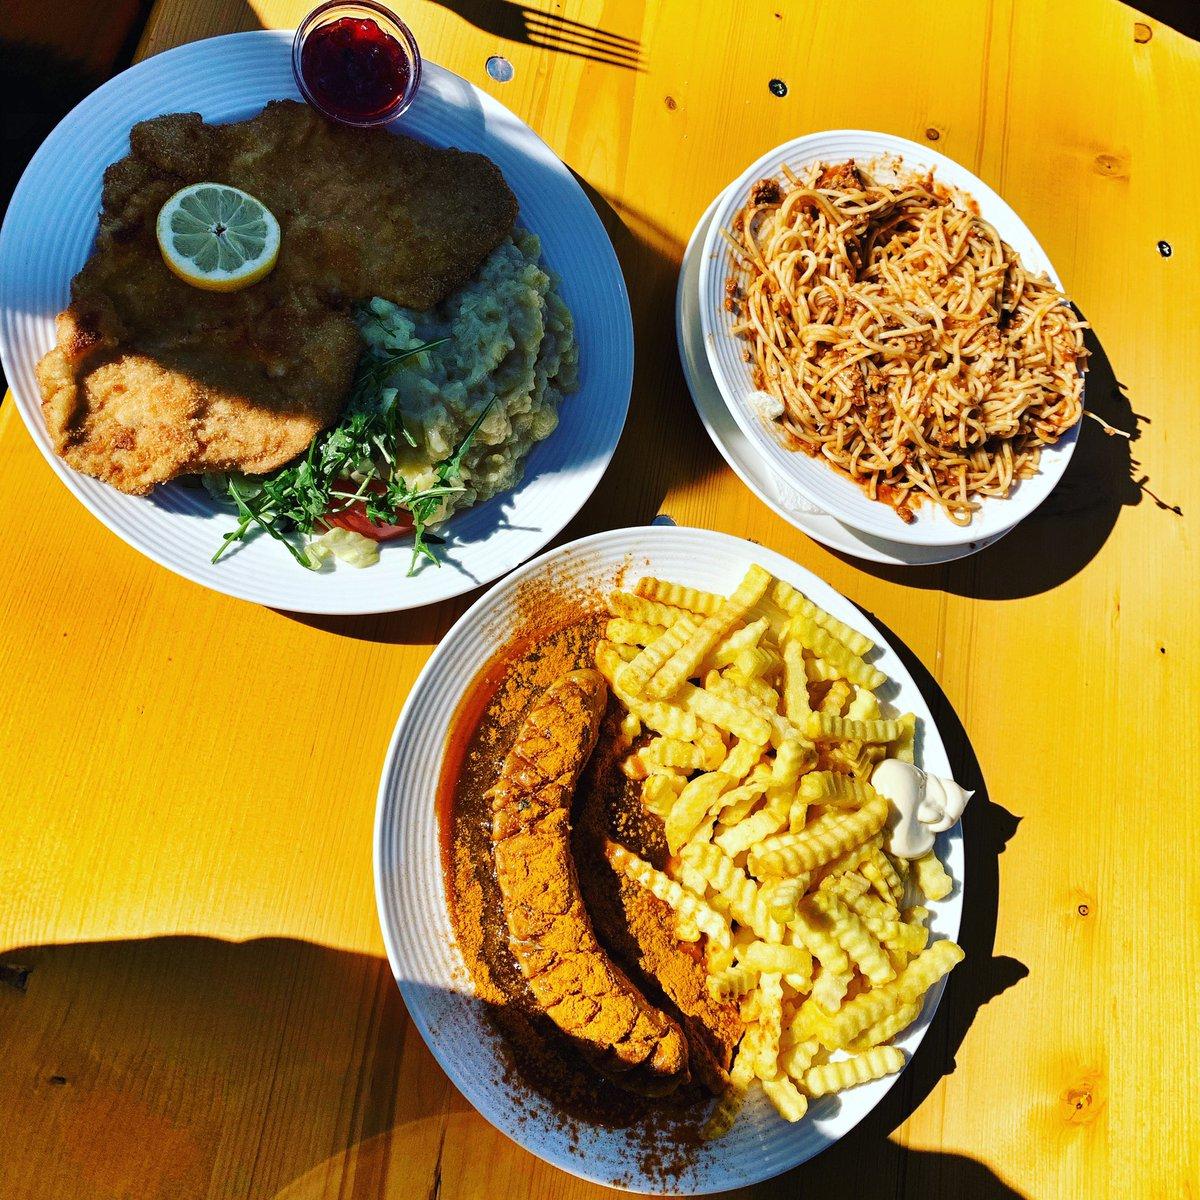 A bite anyone? #wienerschnitzel #spaghetti #currywurst #austria. Whats your favourite winter sports dish?pic.twitter.com/kWUWS0Kf1m